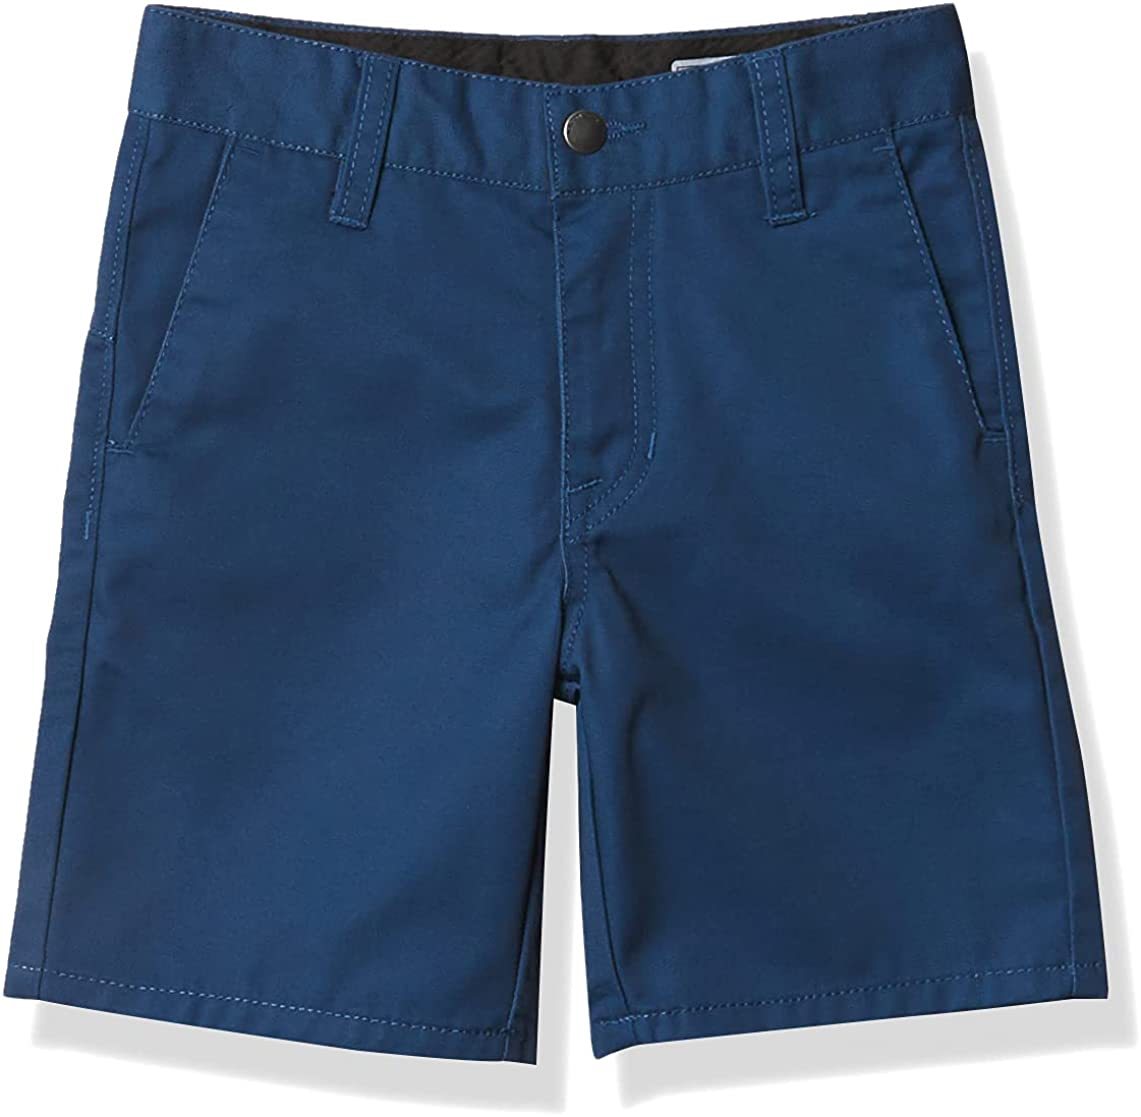 Volcom Frickin Chino Short Little Award Boys Big Sizes 40% OFF Cheap Sale